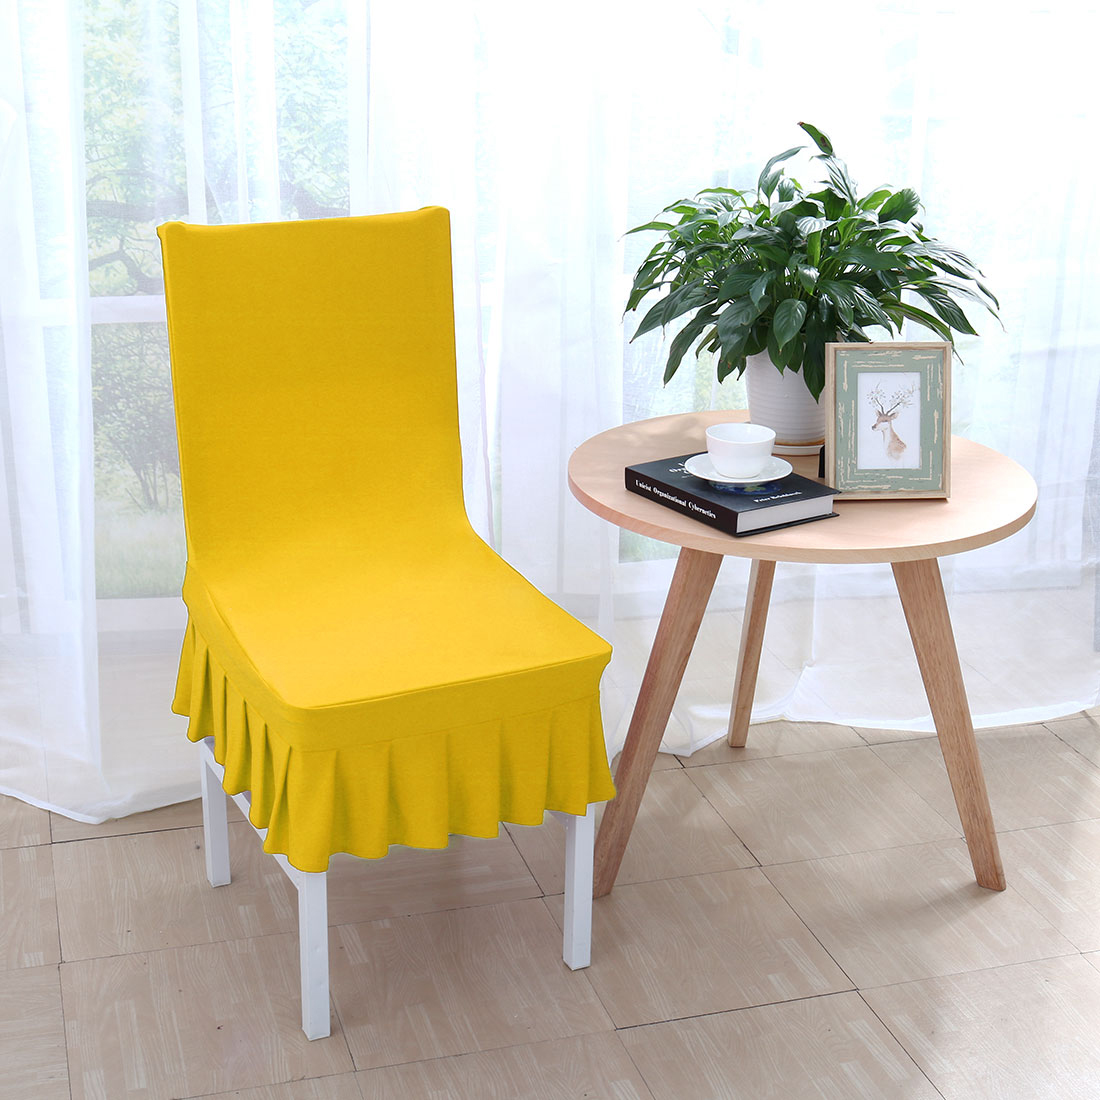 yellow spandex chair sashes leg sliders for carpet stretchy ruffled skirt short dining room